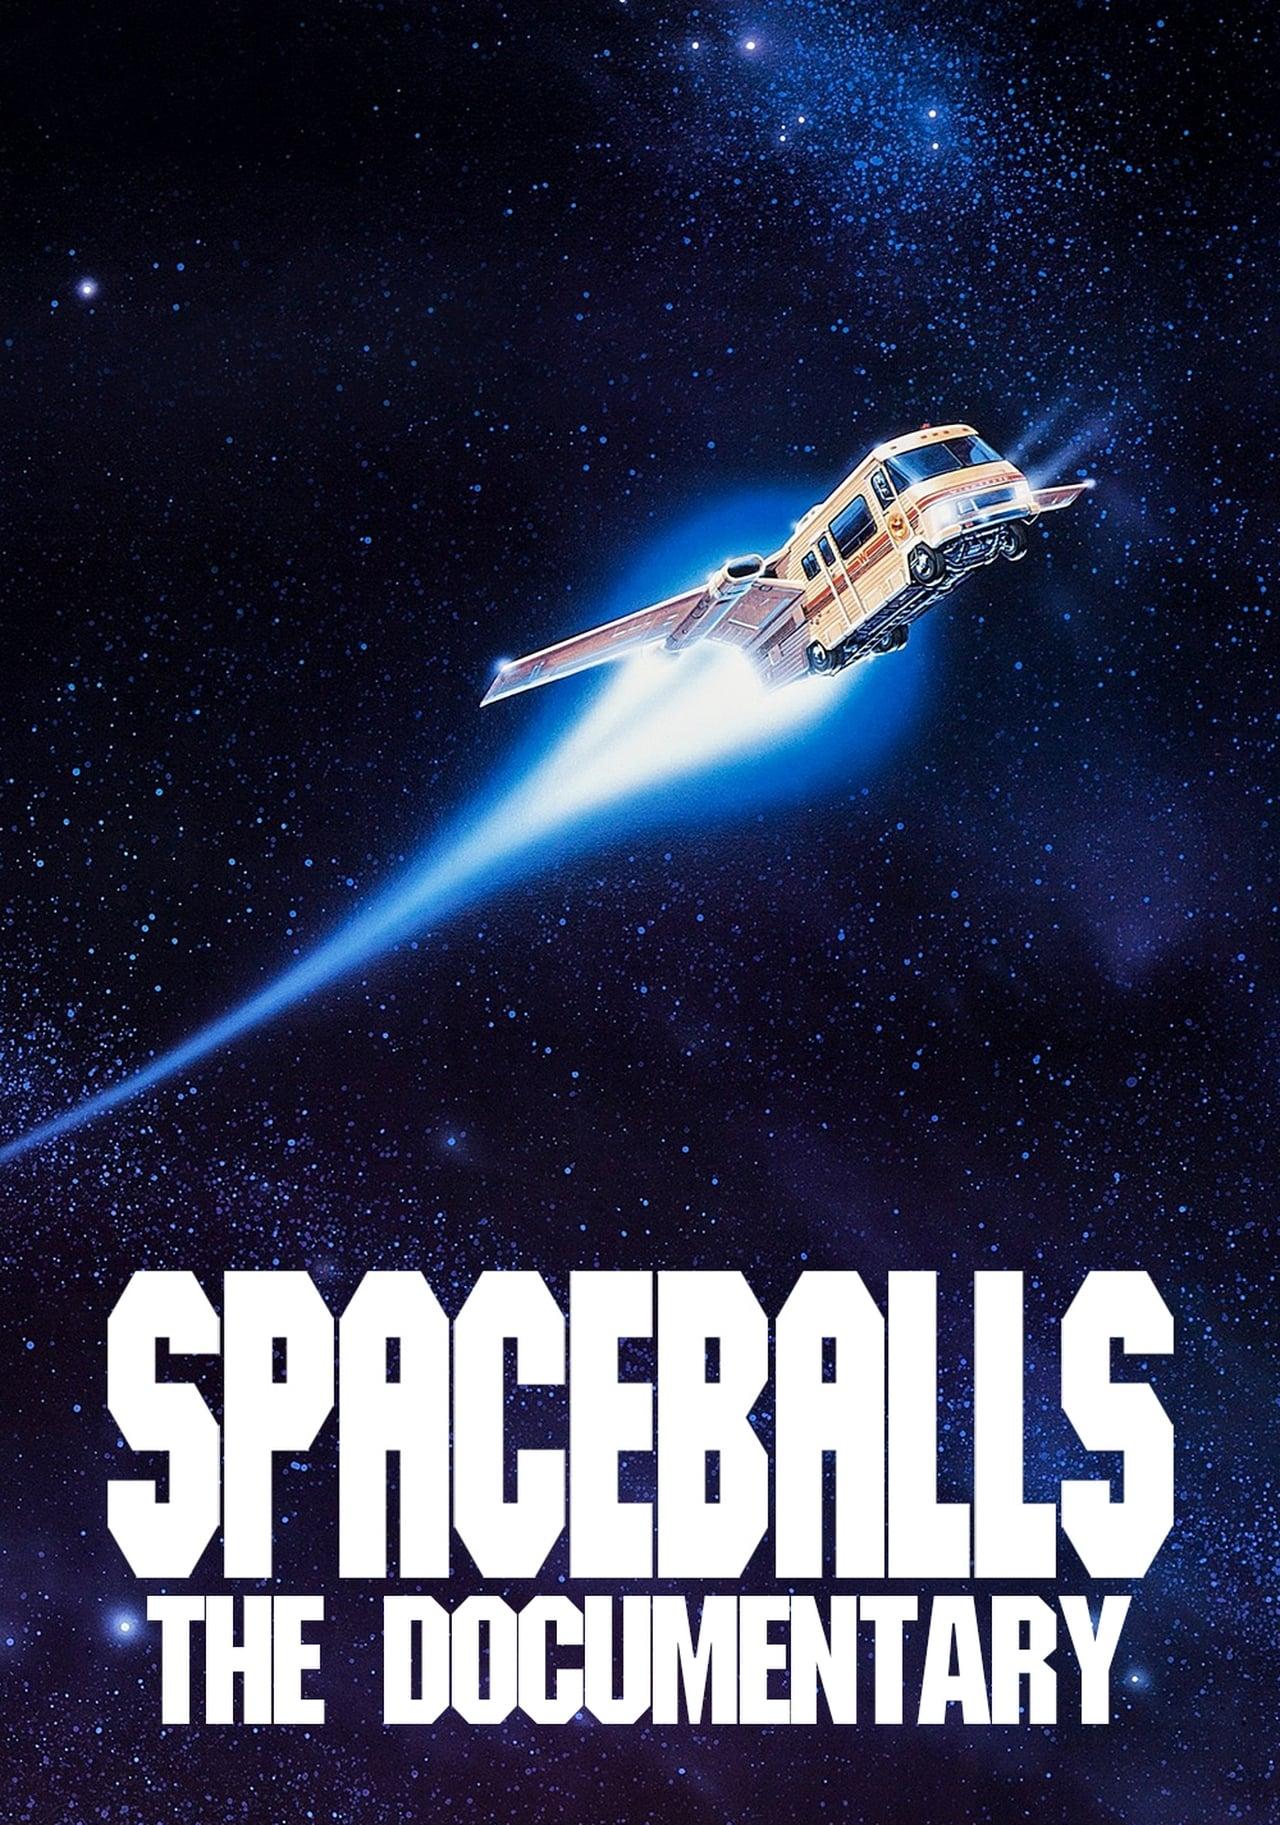 Spaceballs: The Documentary